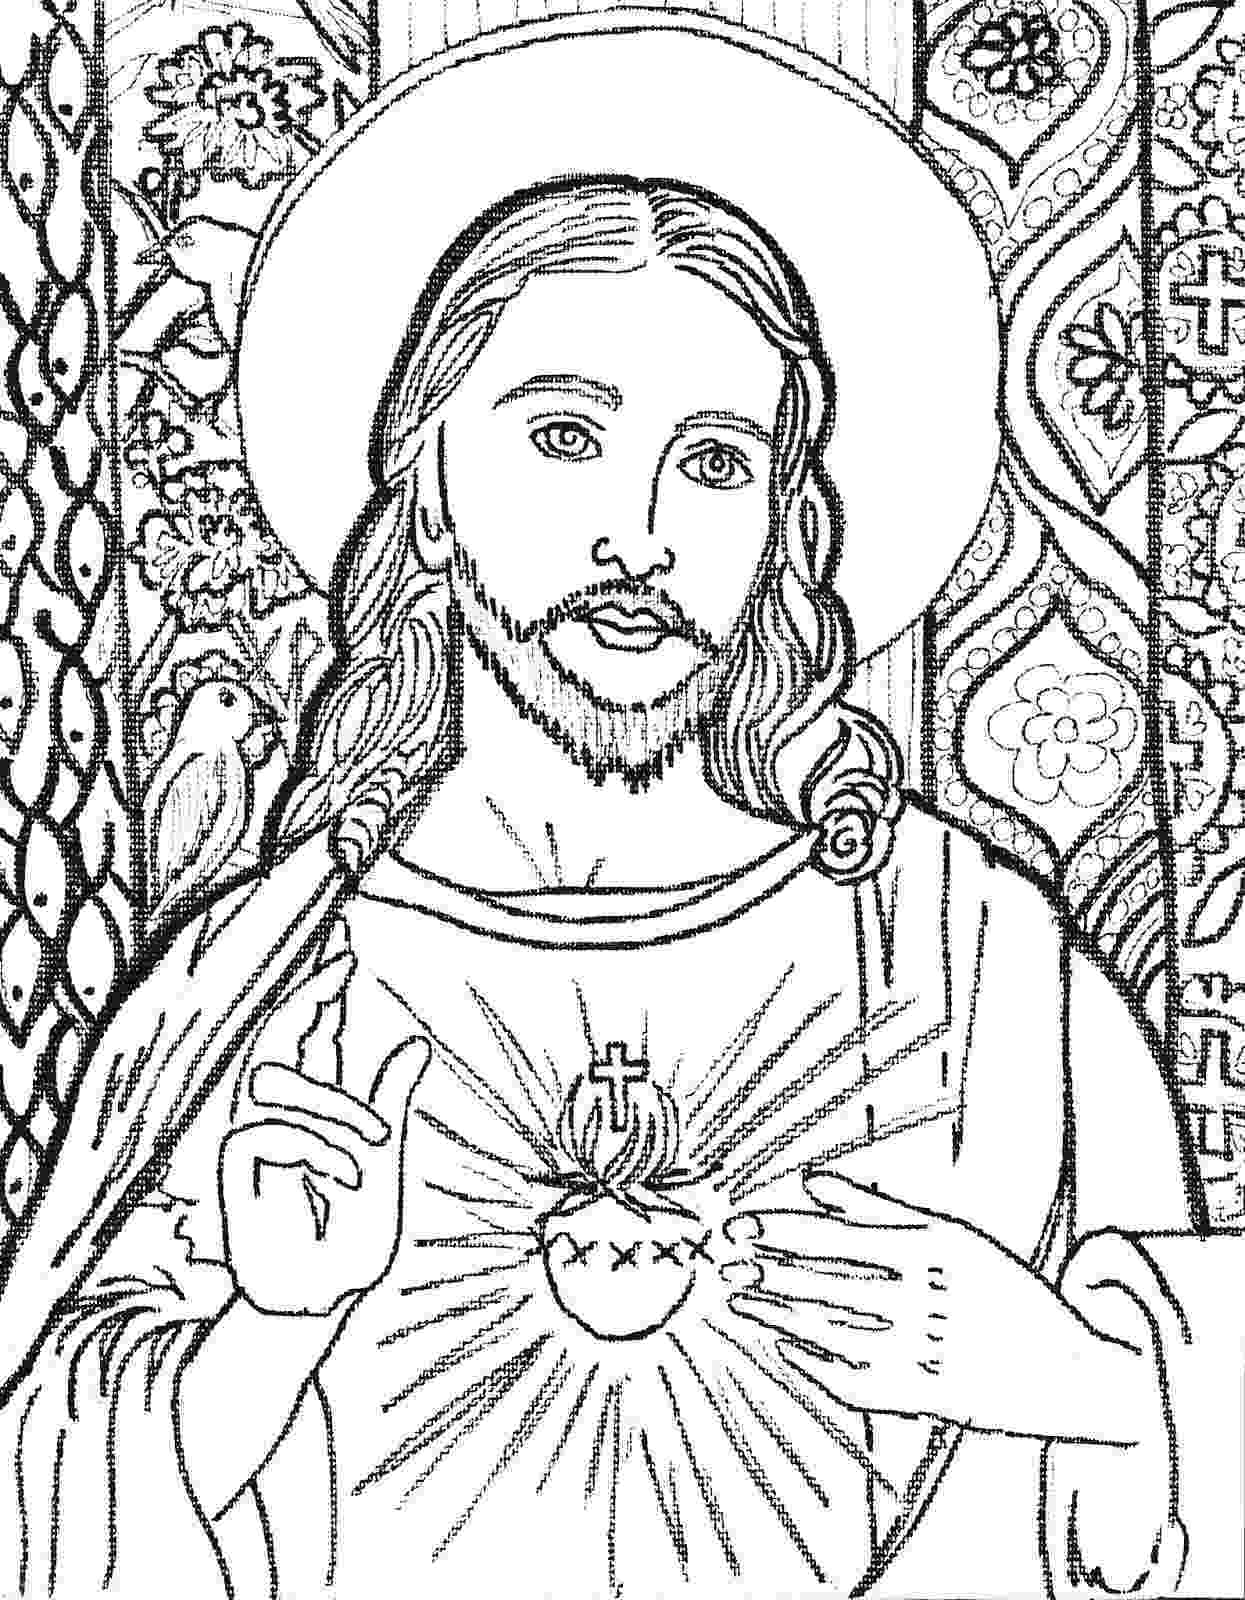 jesus coloring pages free printable jesus coloring pages for kids cool2bkids pages jesus coloring